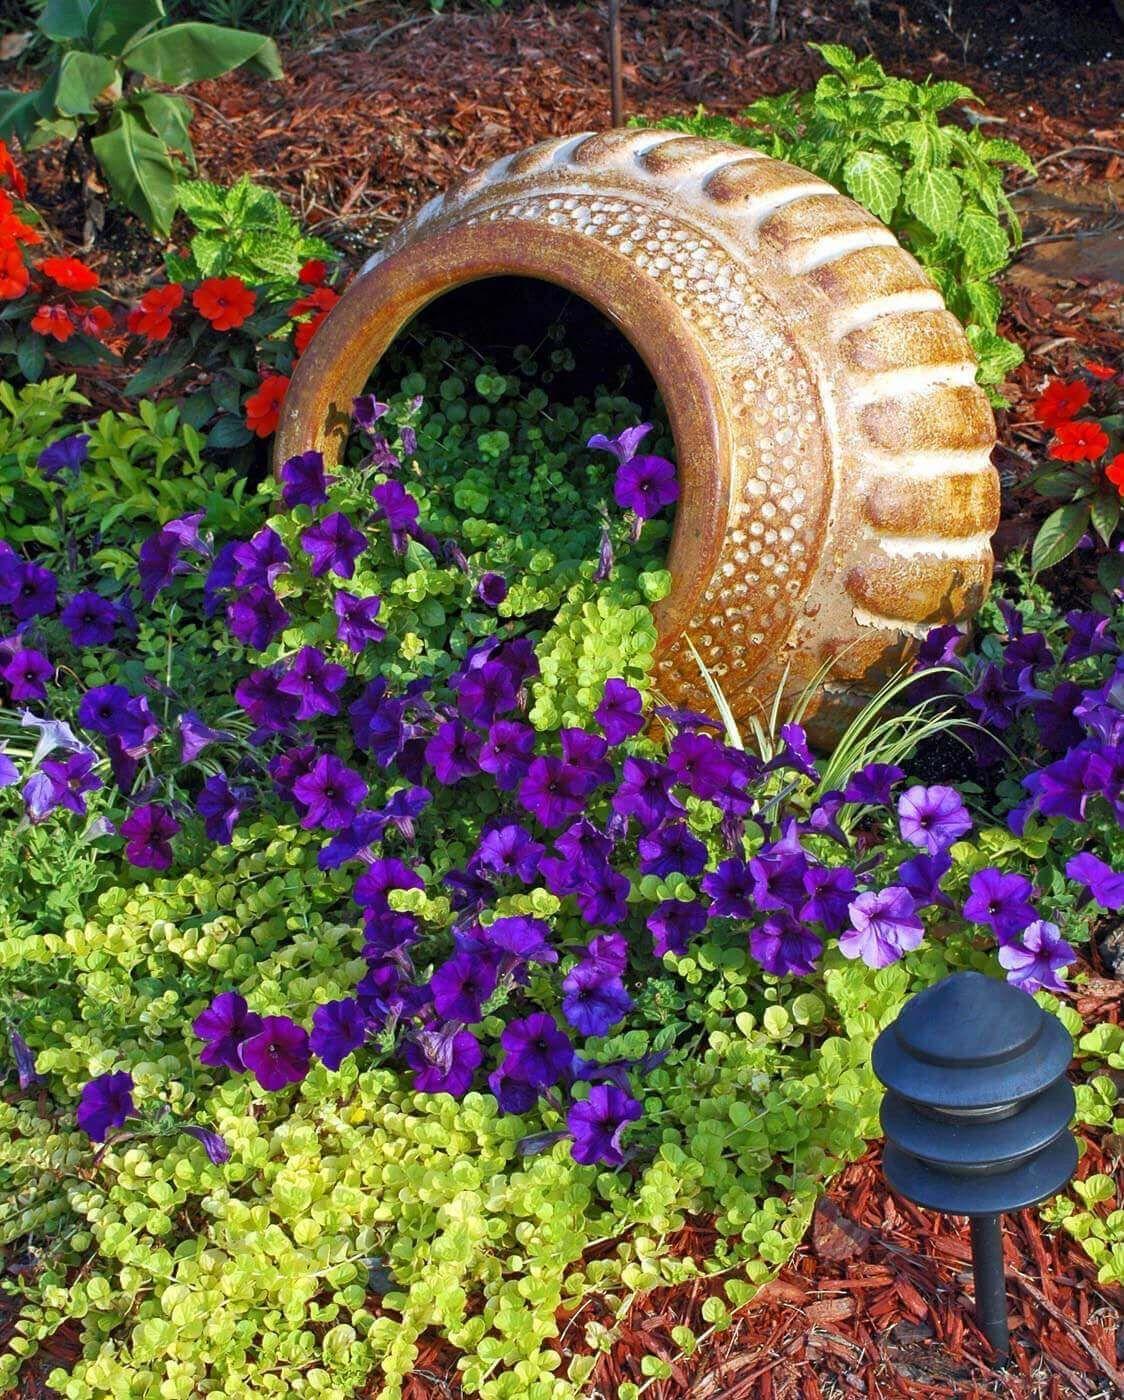 Idee Per Vasi Da Fiori più di 52 fantastiche idee per vasi di fiori versati: quell&